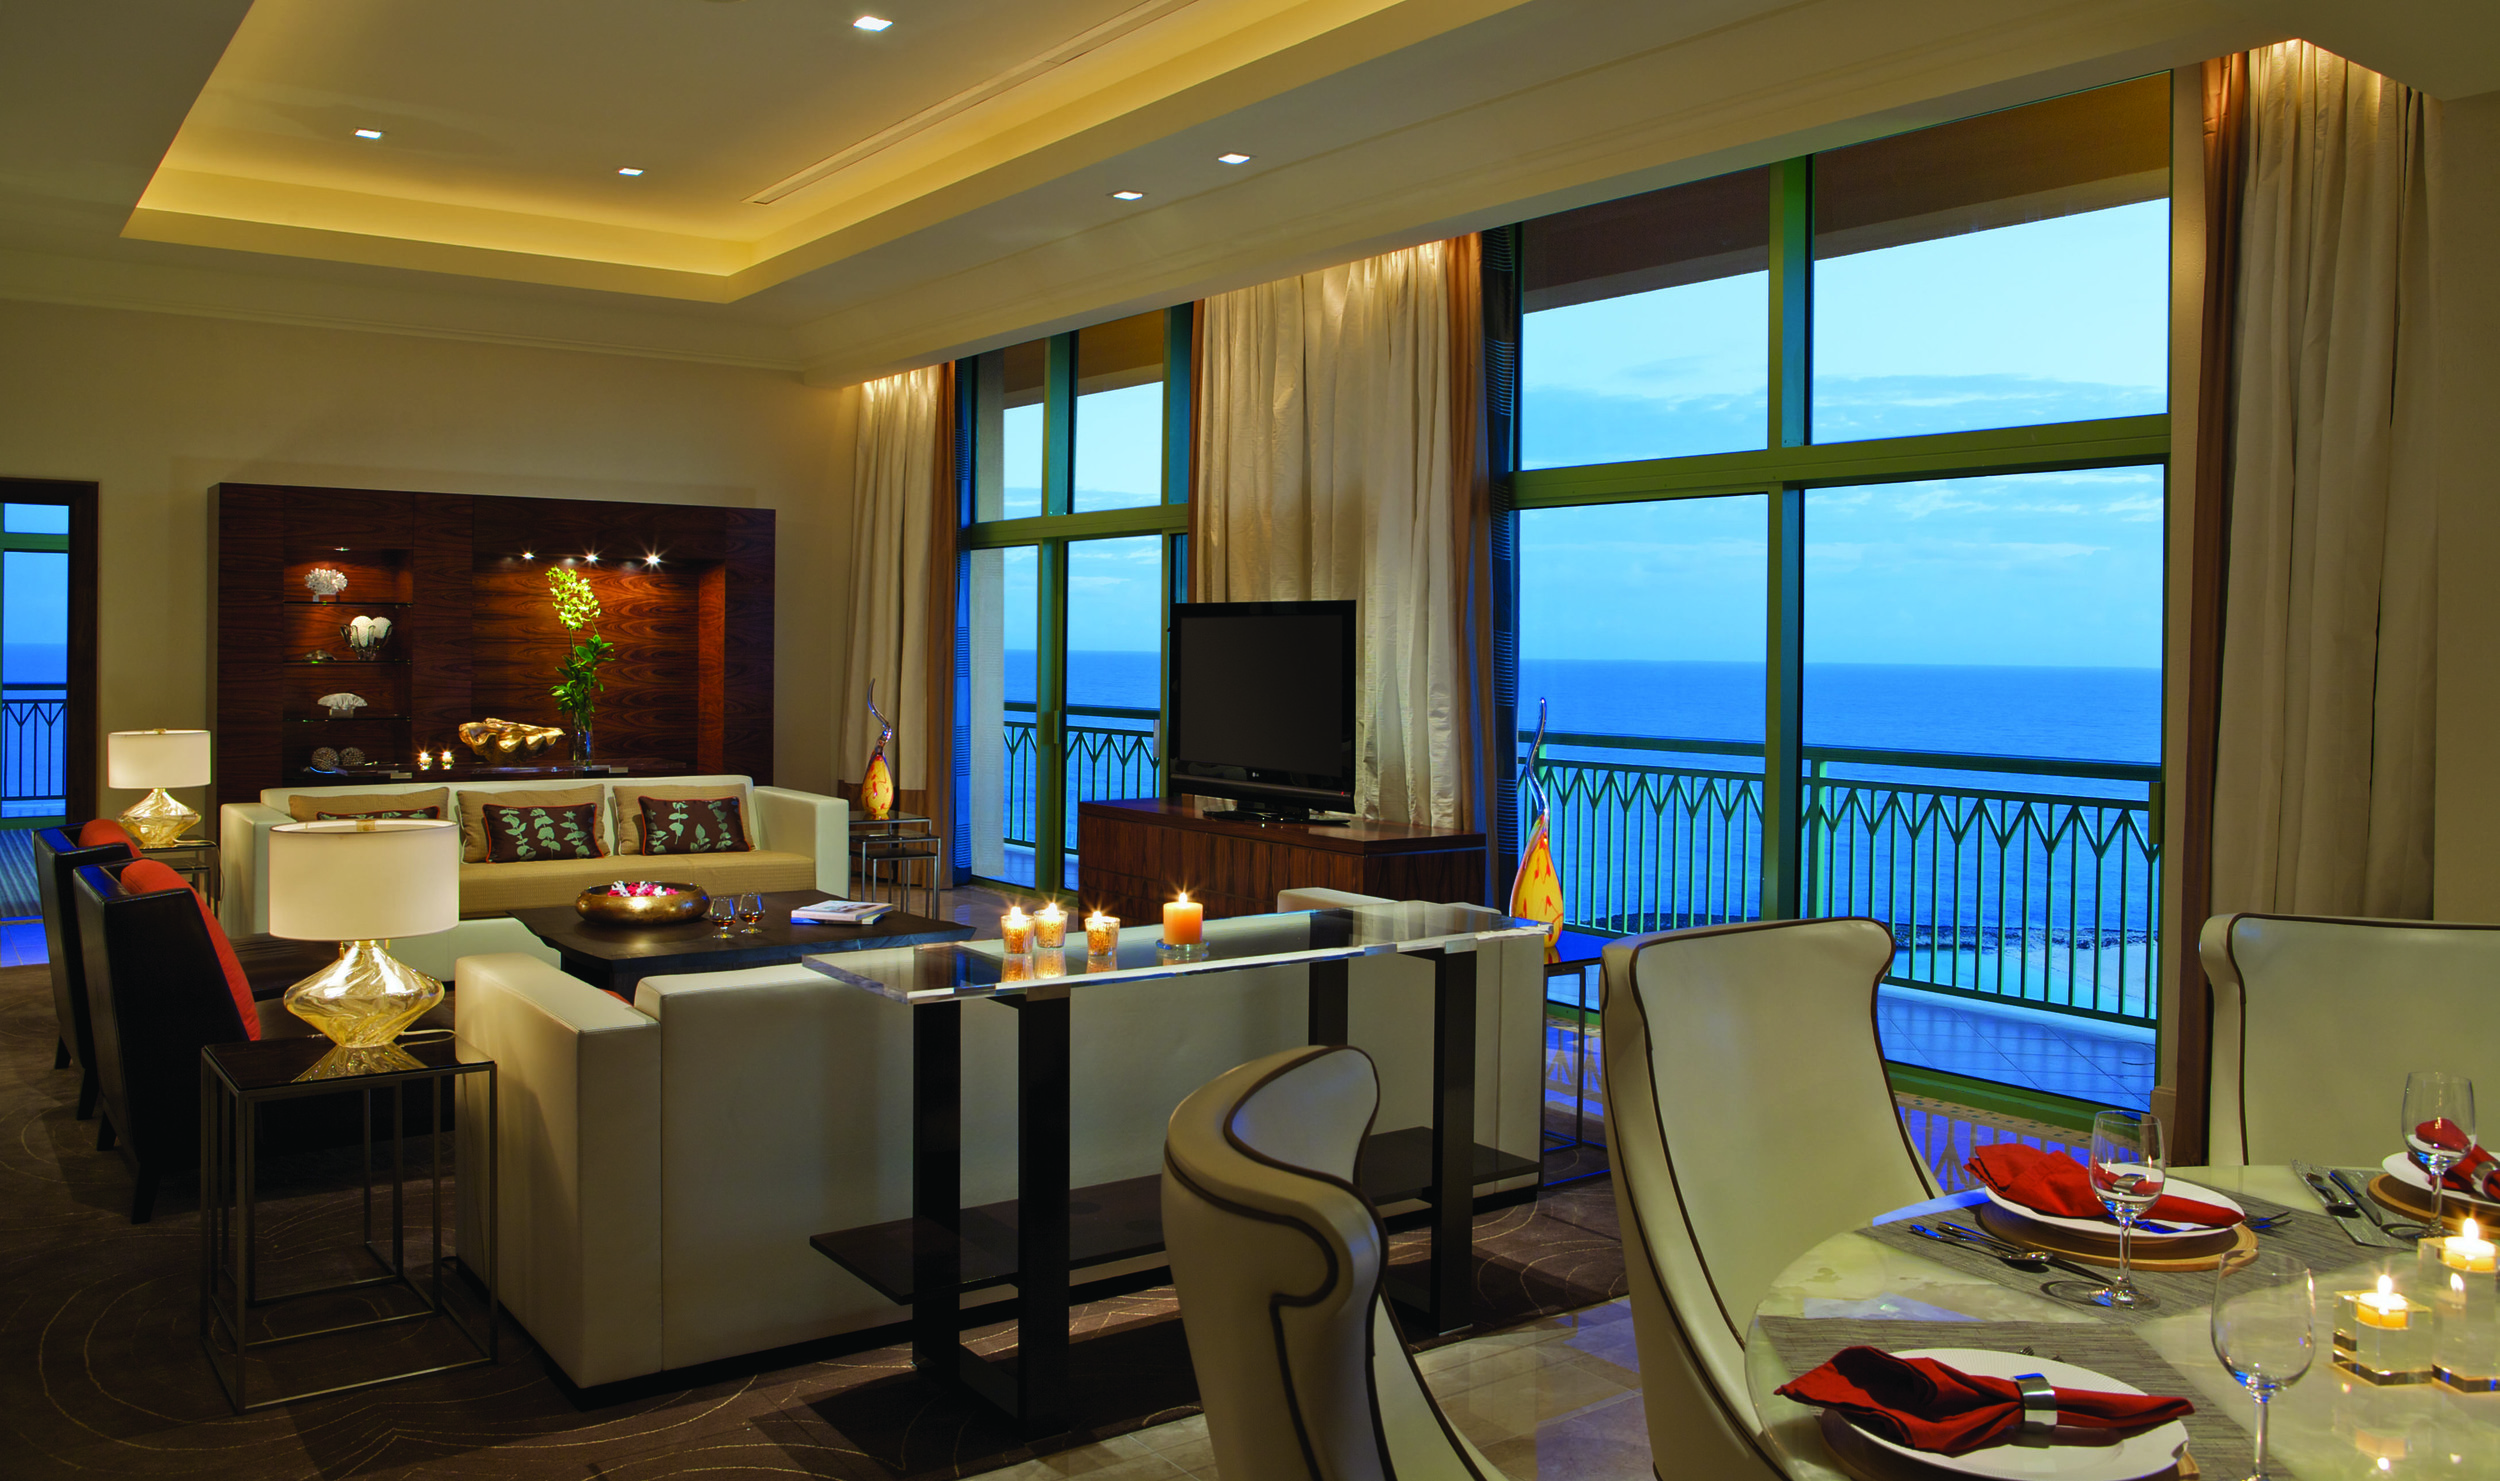 Penthouse_Living_Room_1369_high.jpg